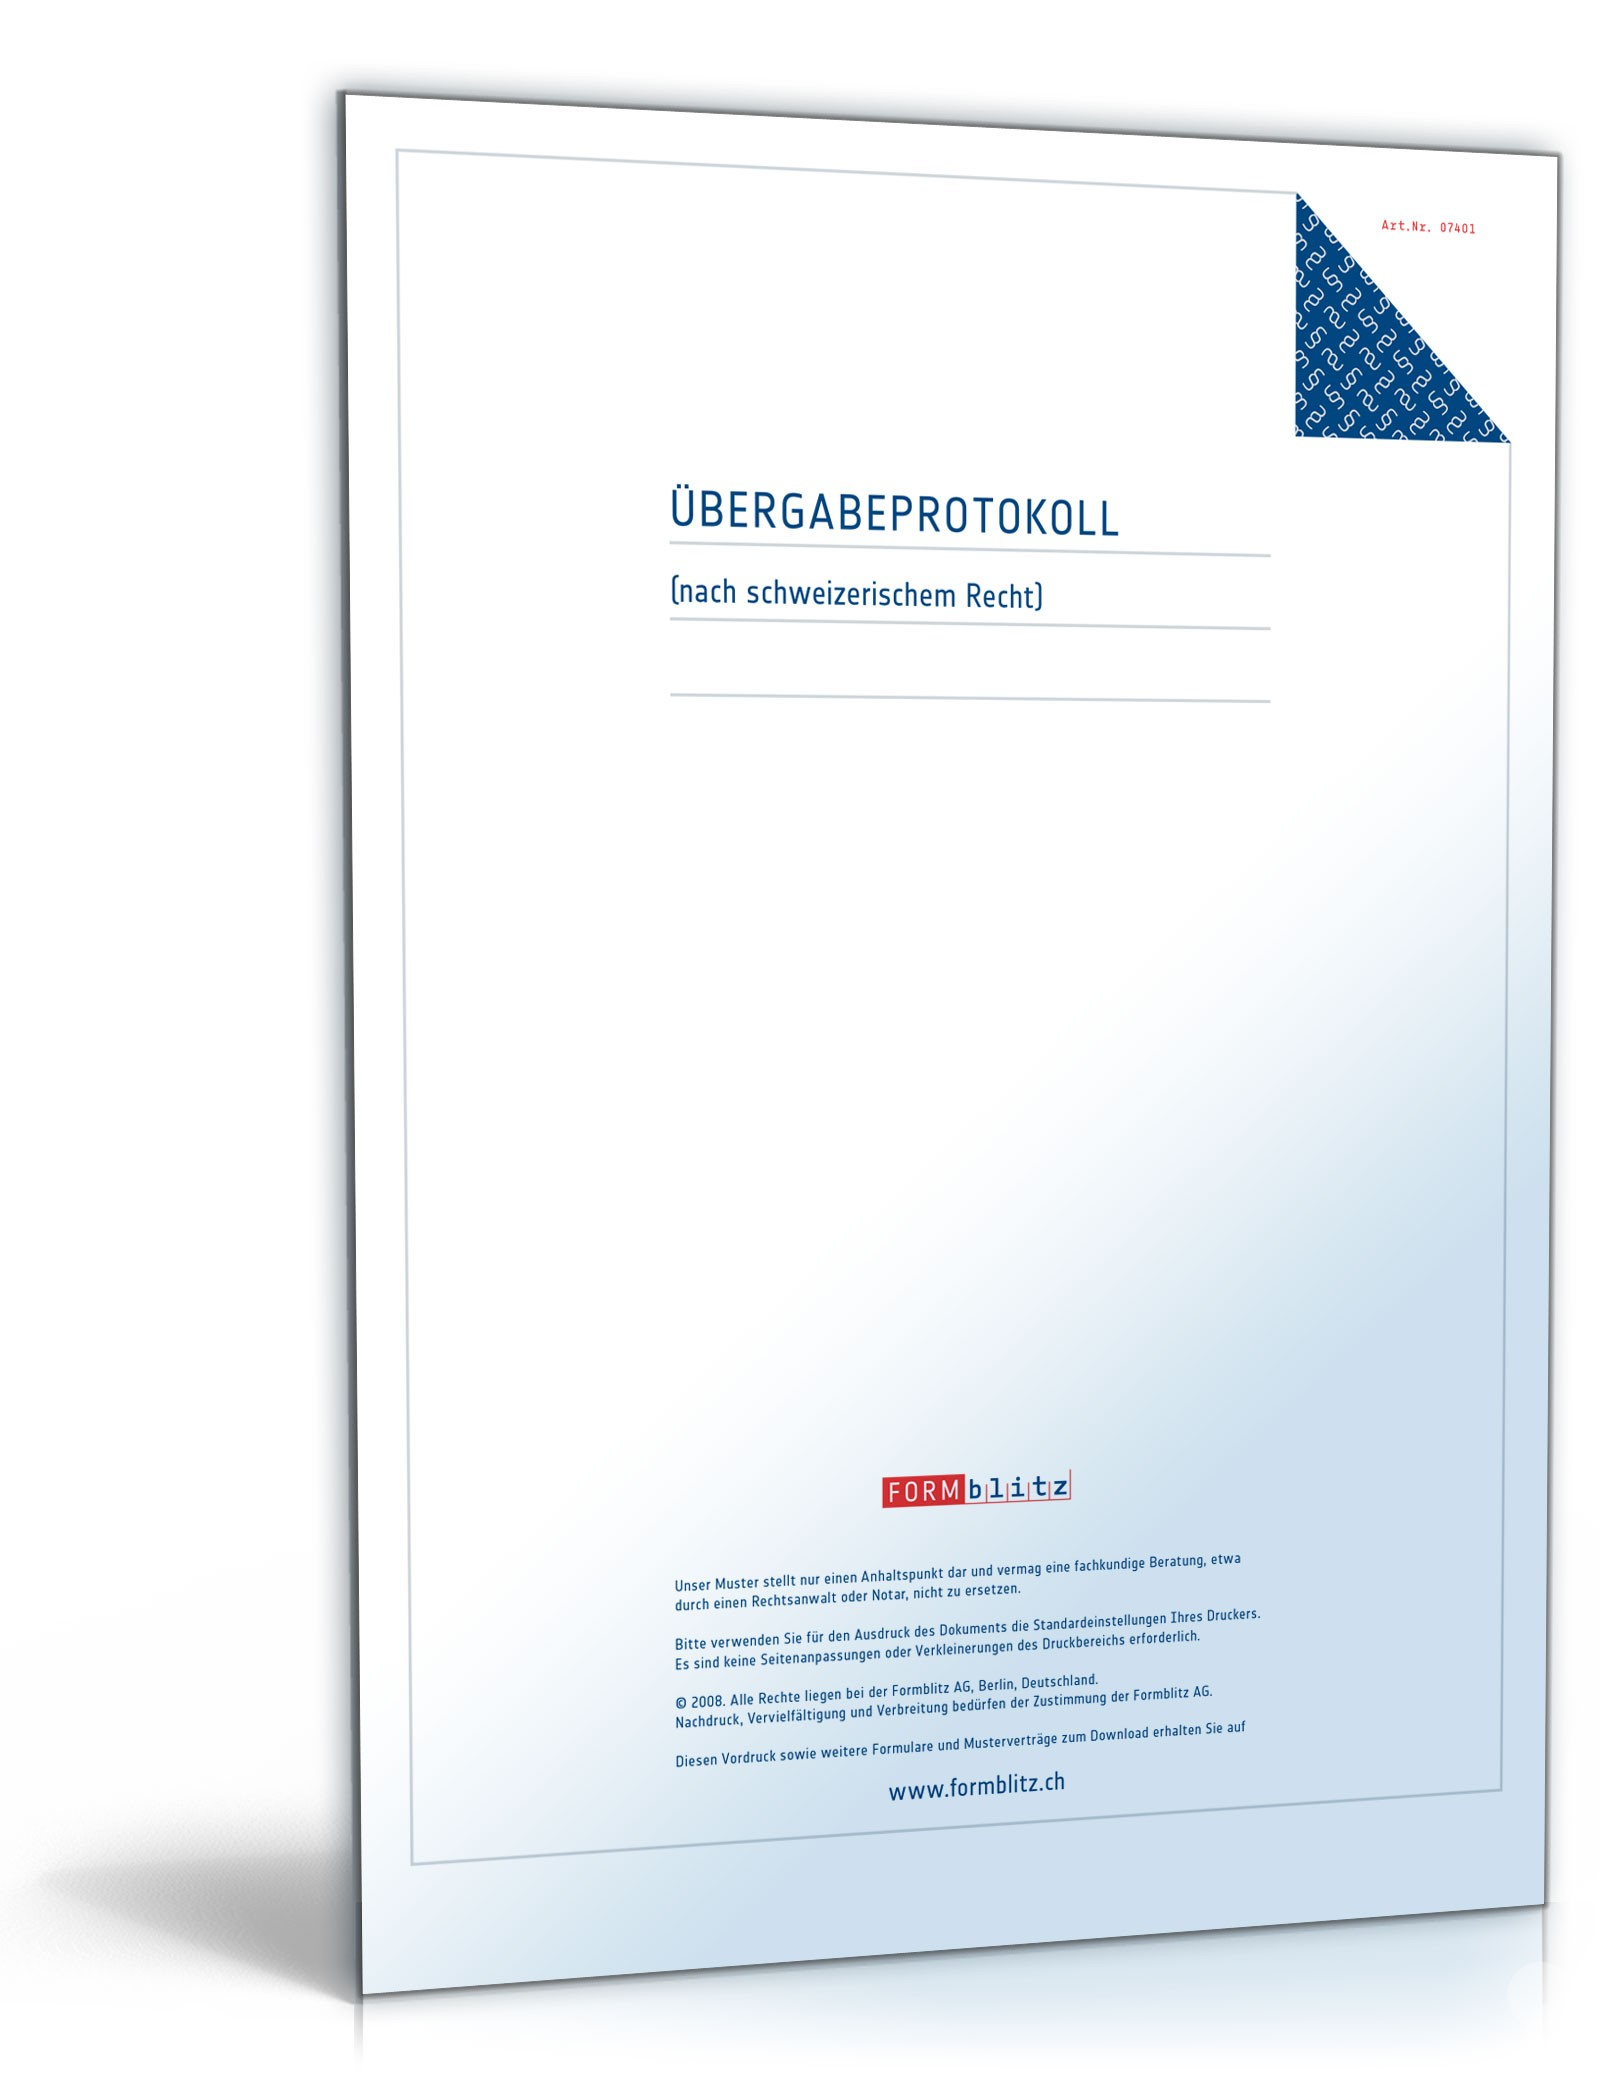 bergabeprotokoll als anlage eines mietvertrages - Ubergabeprotokoll Muster